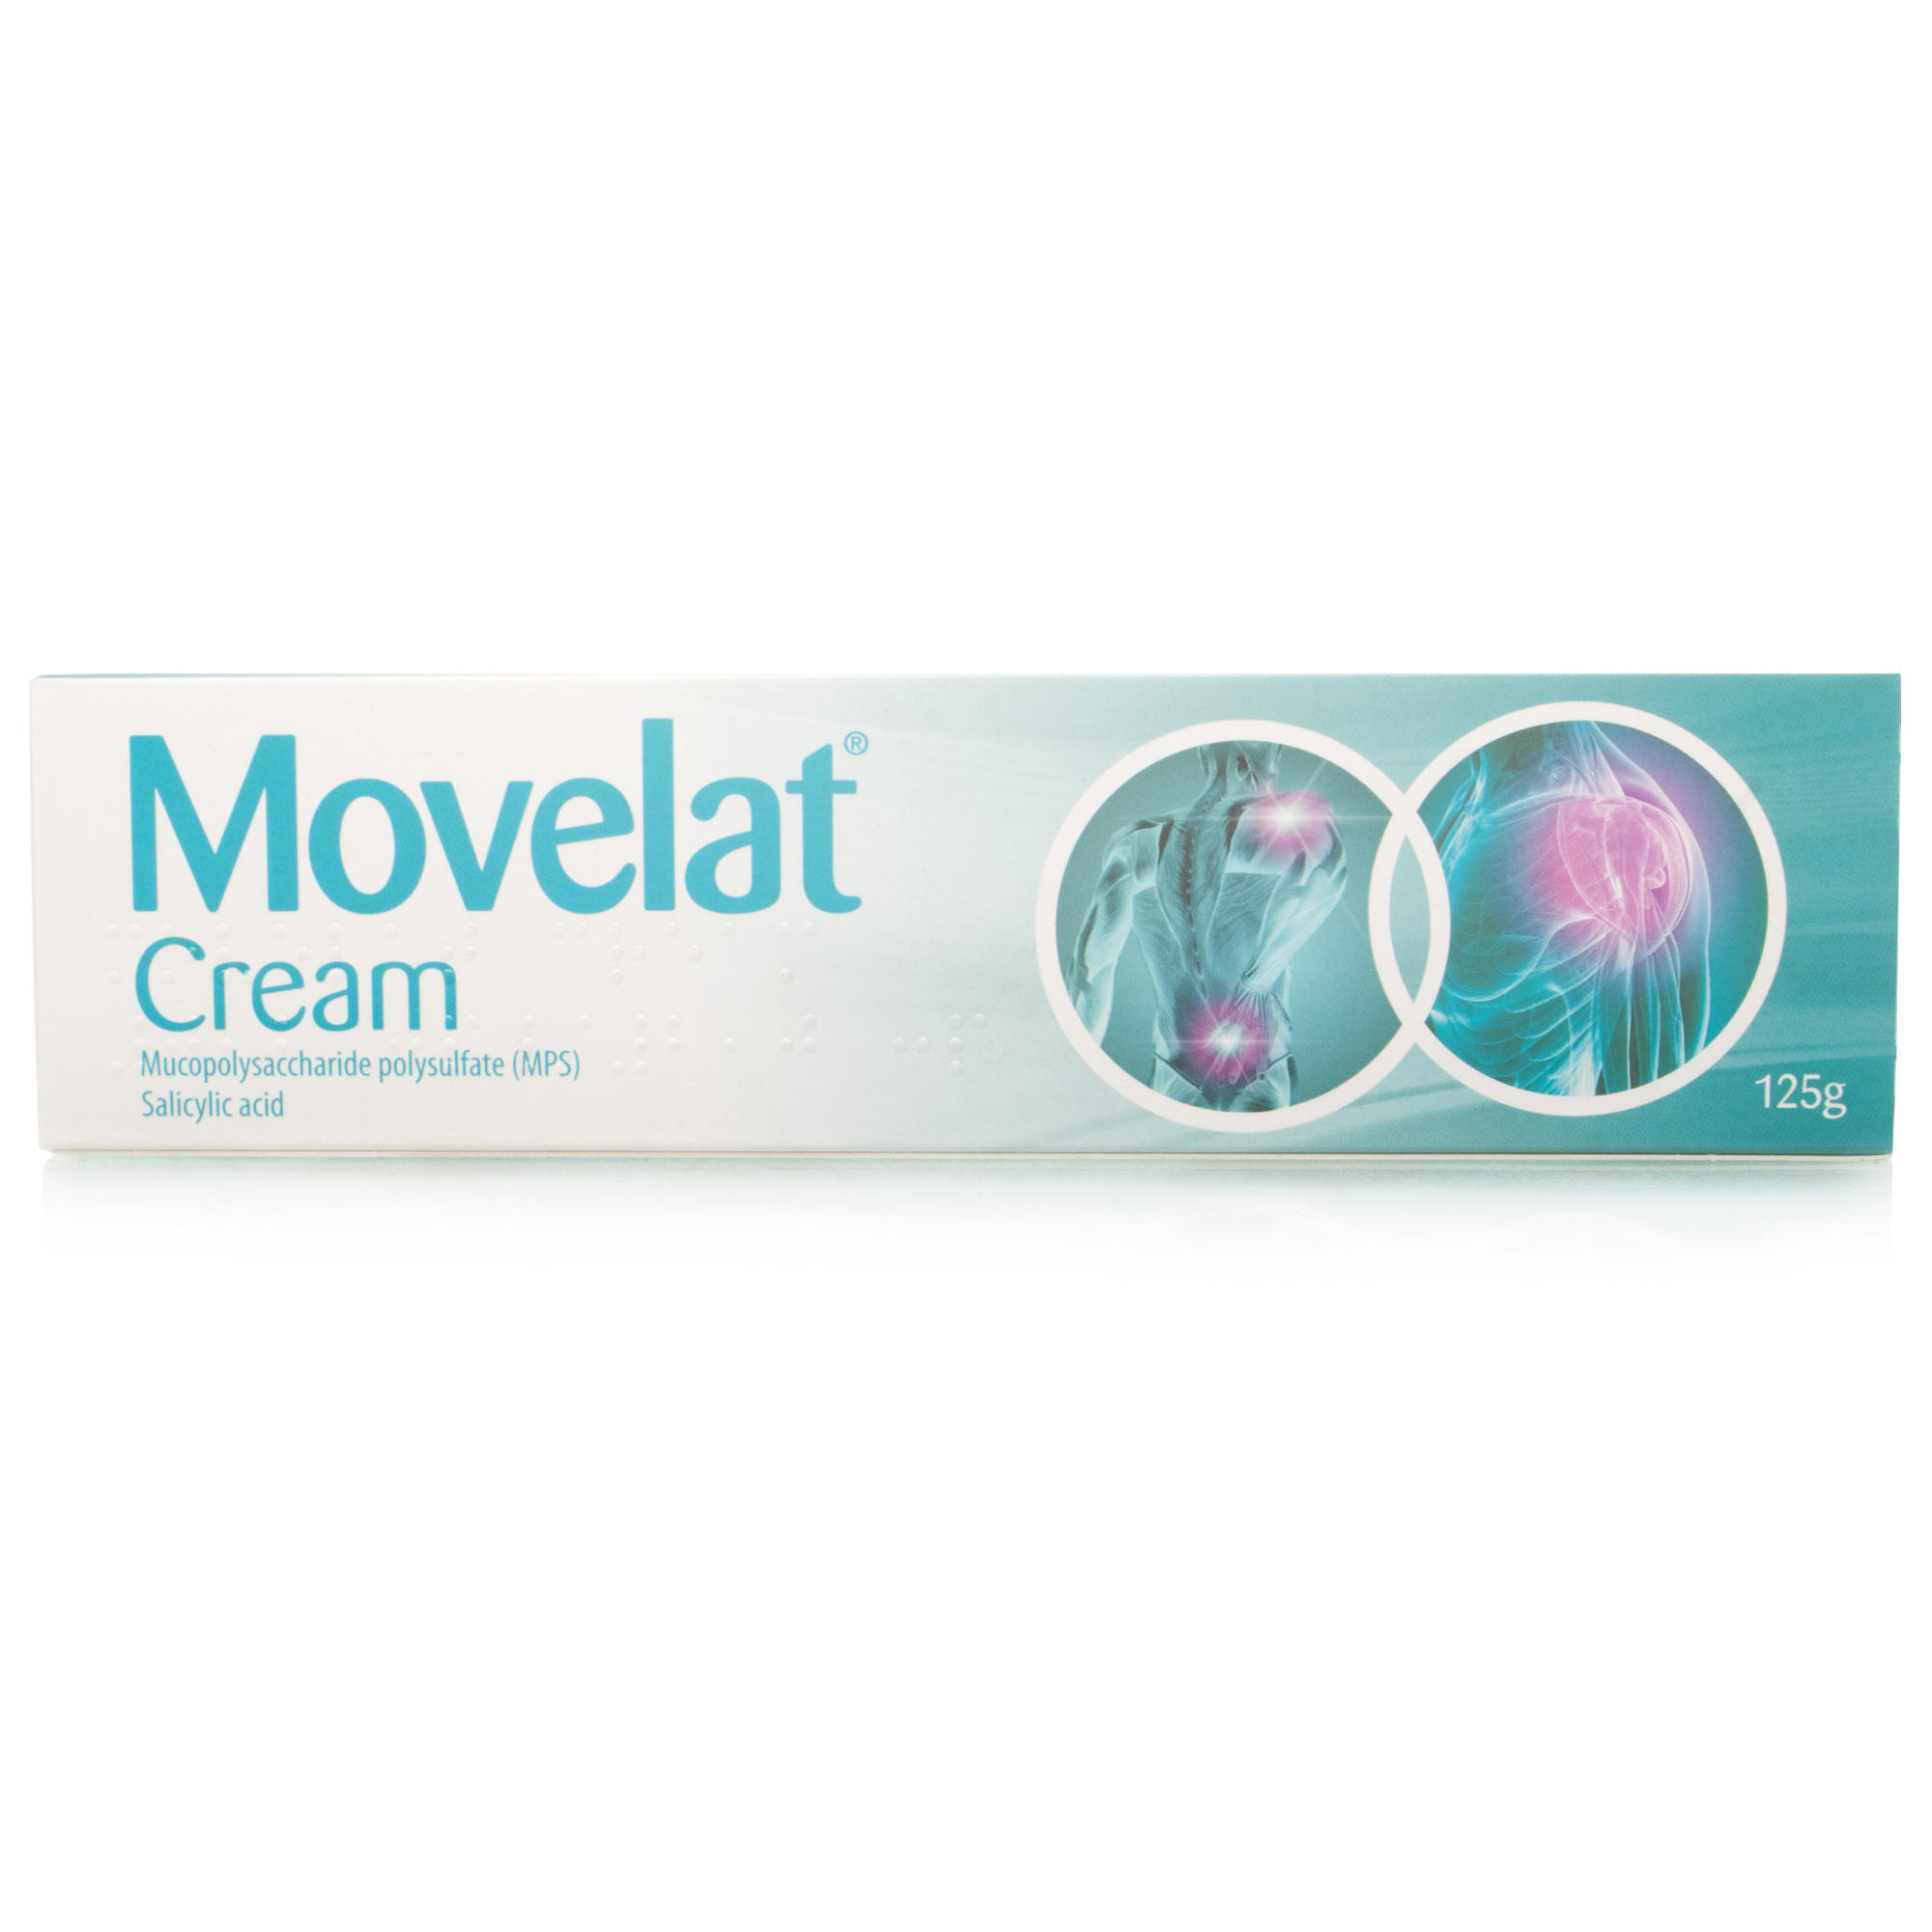 Movelat Cream